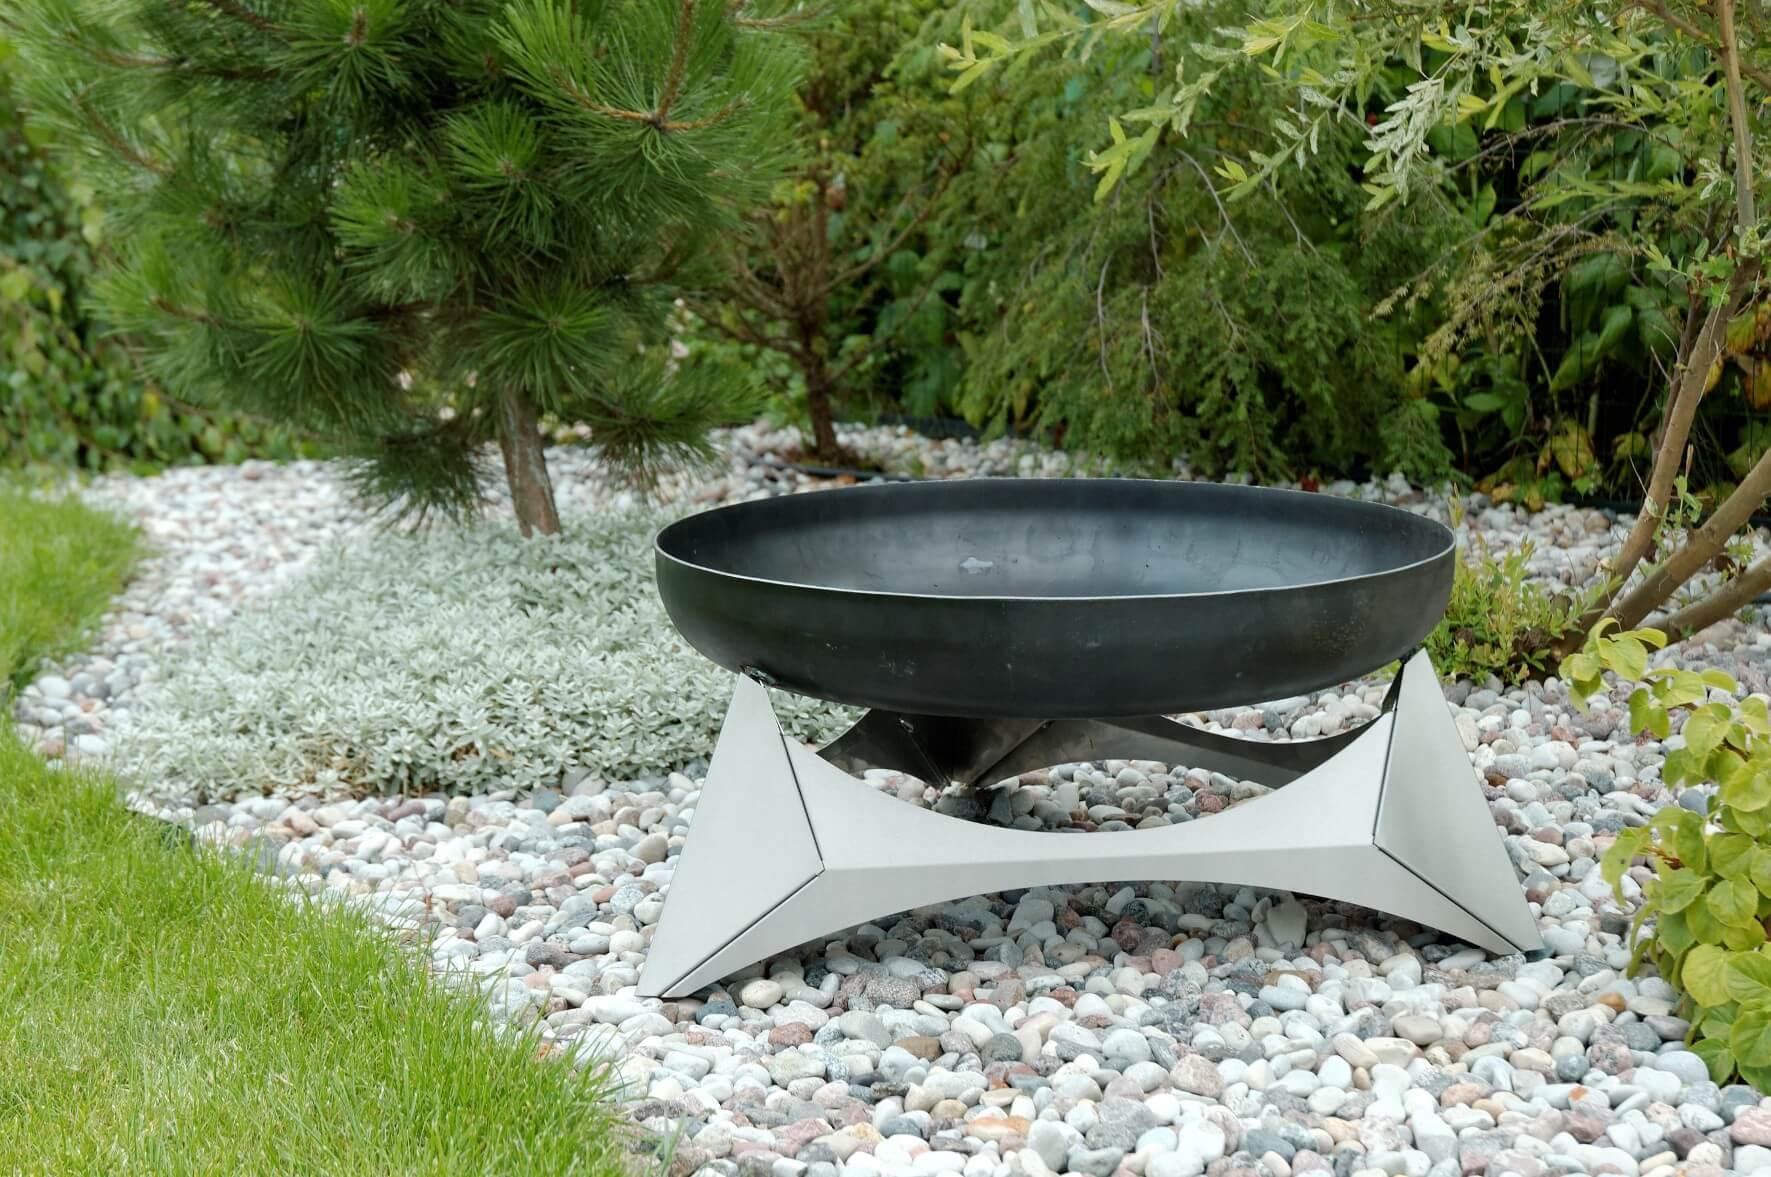 design feuerschale arka edelstahl metall feuerstelle brenntopf feuerschale ebay. Black Bedroom Furniture Sets. Home Design Ideas